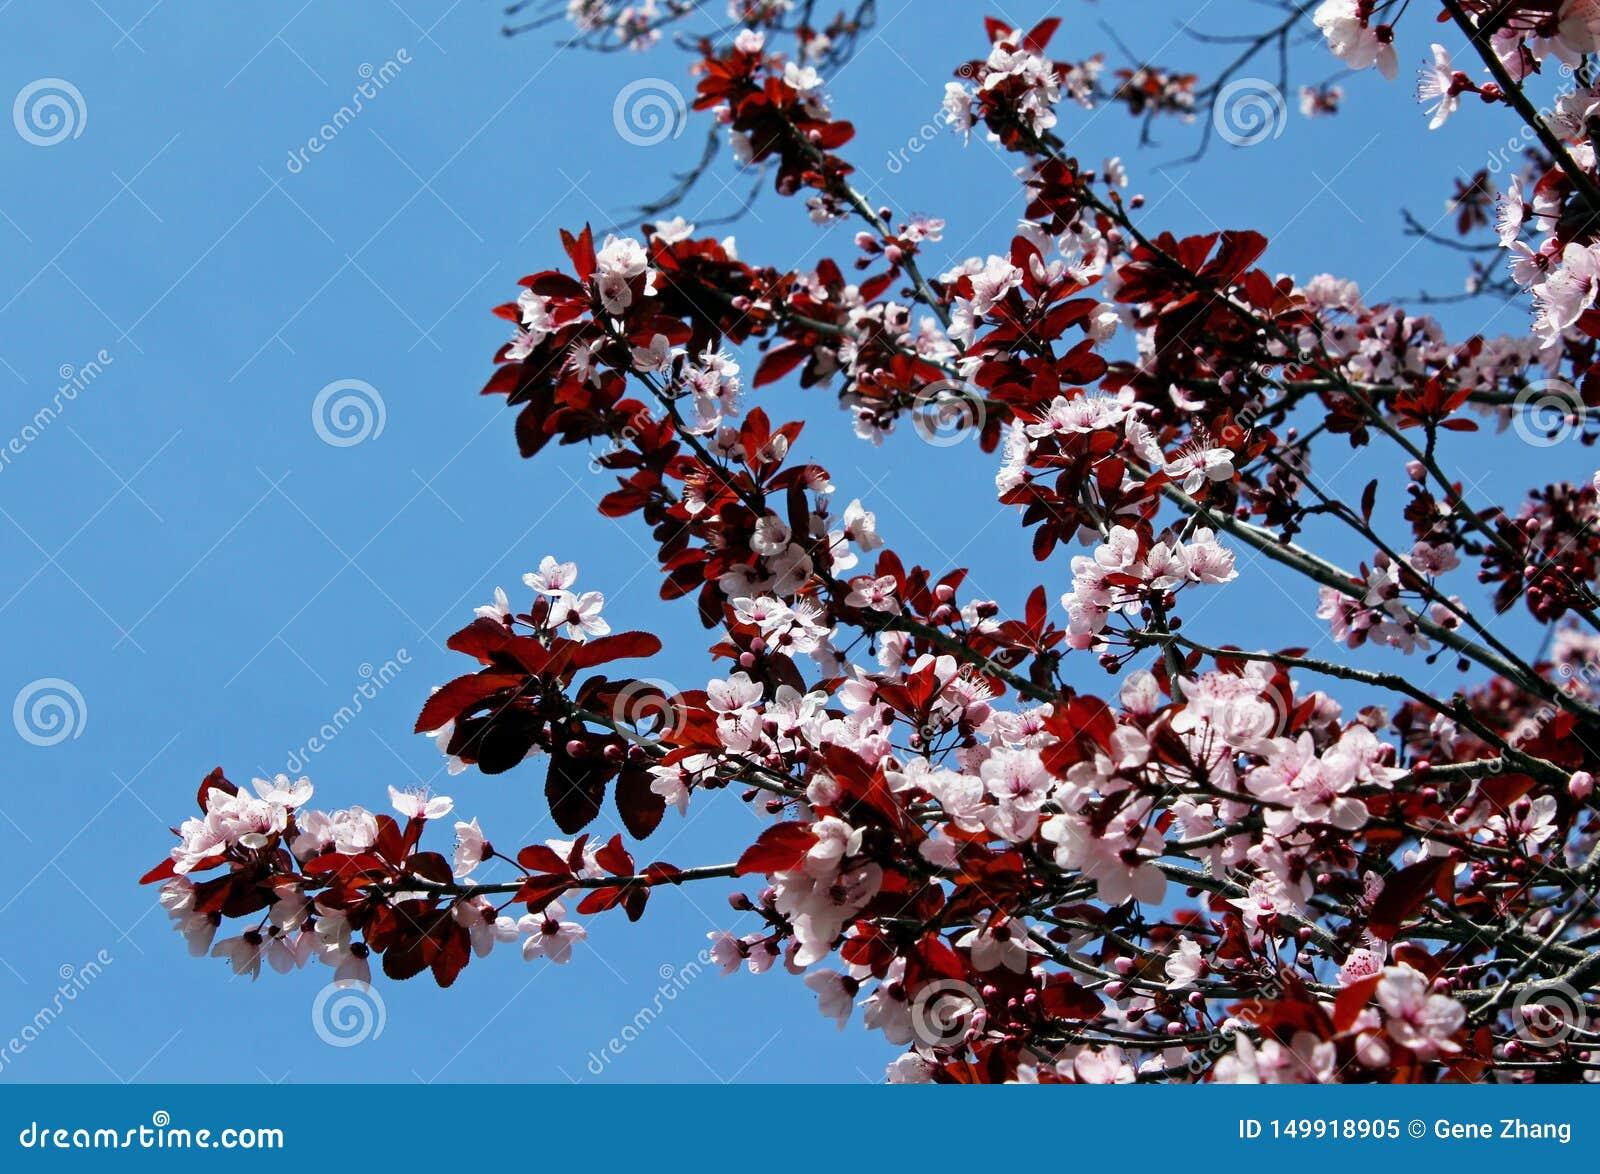 Purple Leaf Sand Cherry Blossom Stock Image Image Of Sand Plum